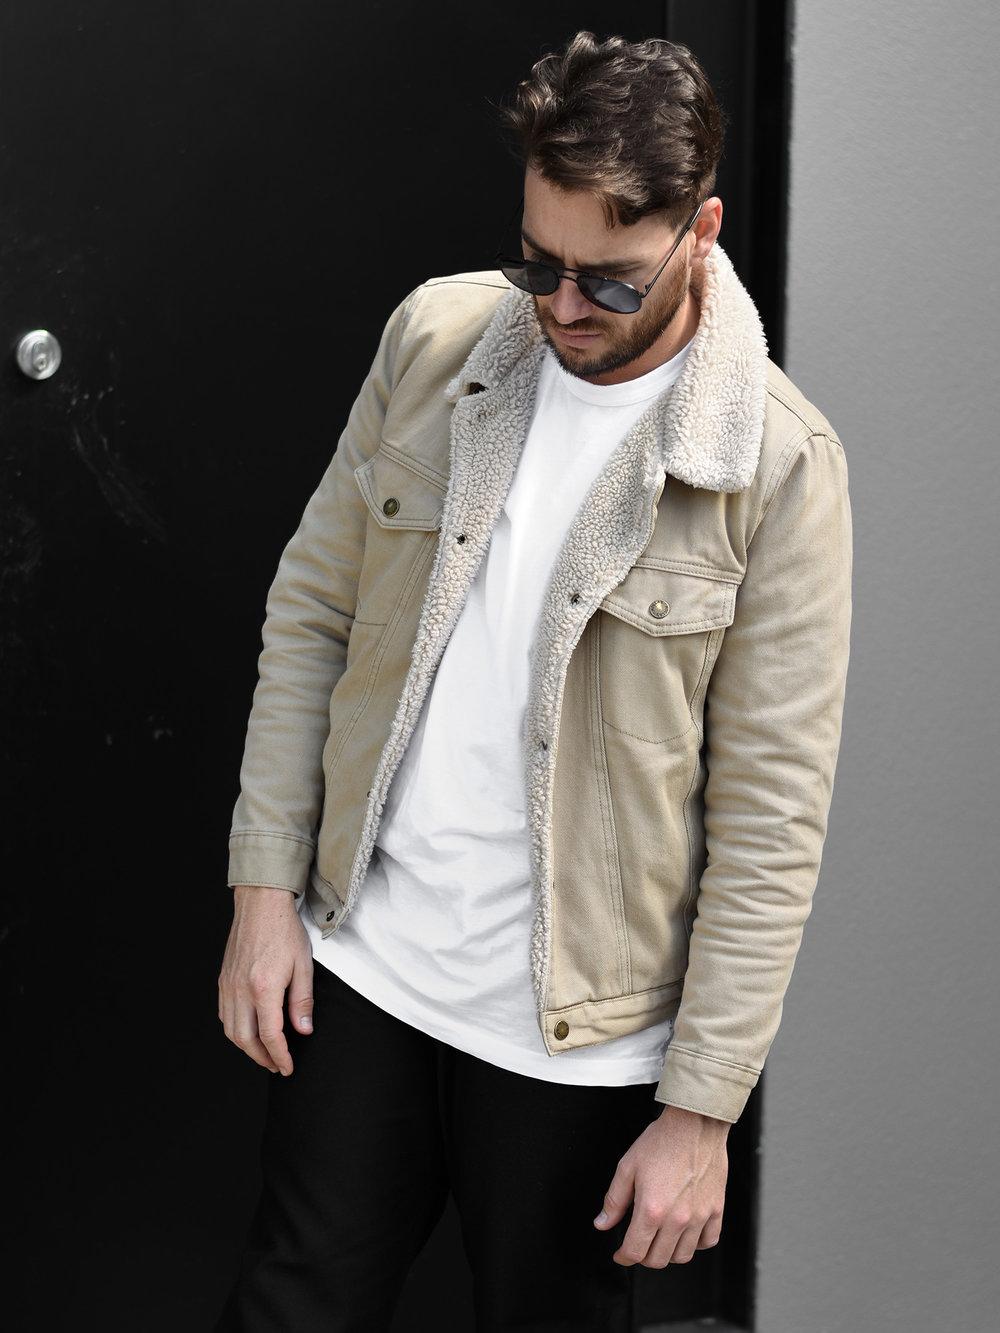 jaheb_barnett_mens_fashion_blogger_rollas_sherpa_denim_jacket_acne_studios_wool_pants_bailey_nelson